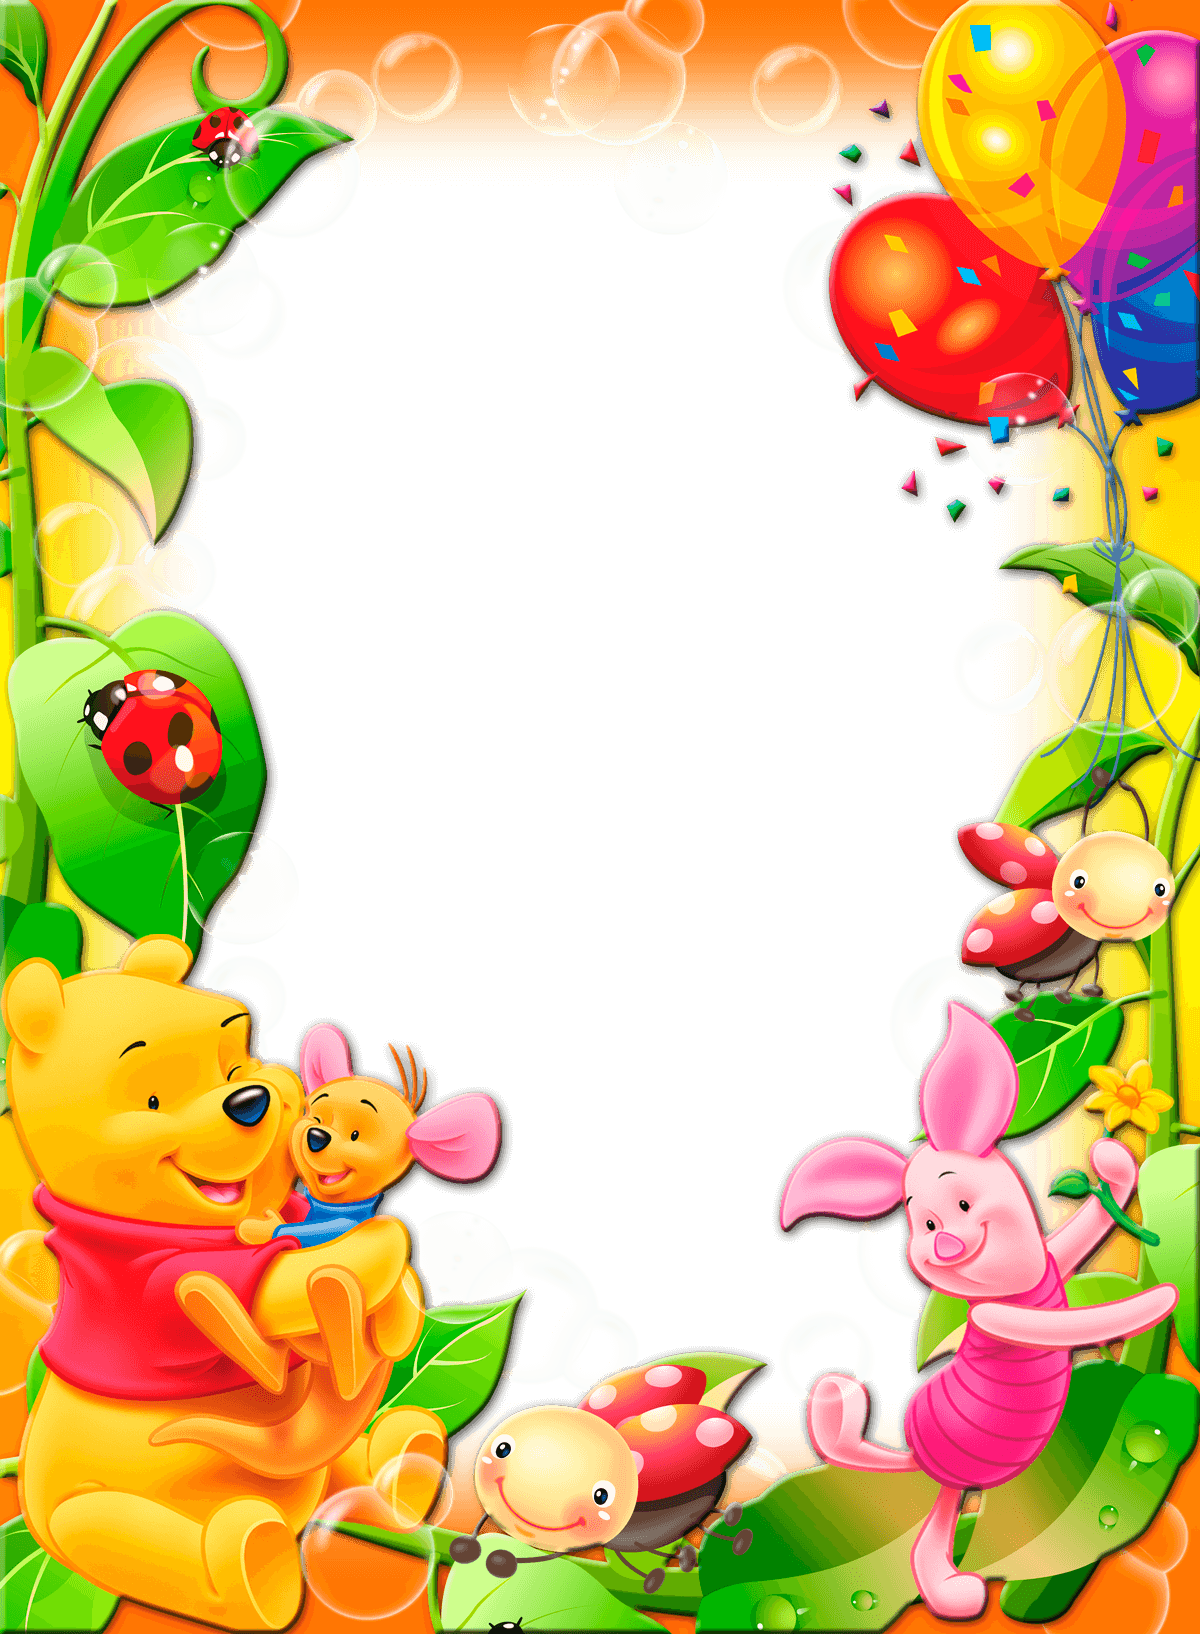 Marco De Foto Winnie The Pooh Marco De Foto Winnie The Pooh g - Marco De Foto Winnie_The_Pooh Marco De Foto Winnie The Pooh g